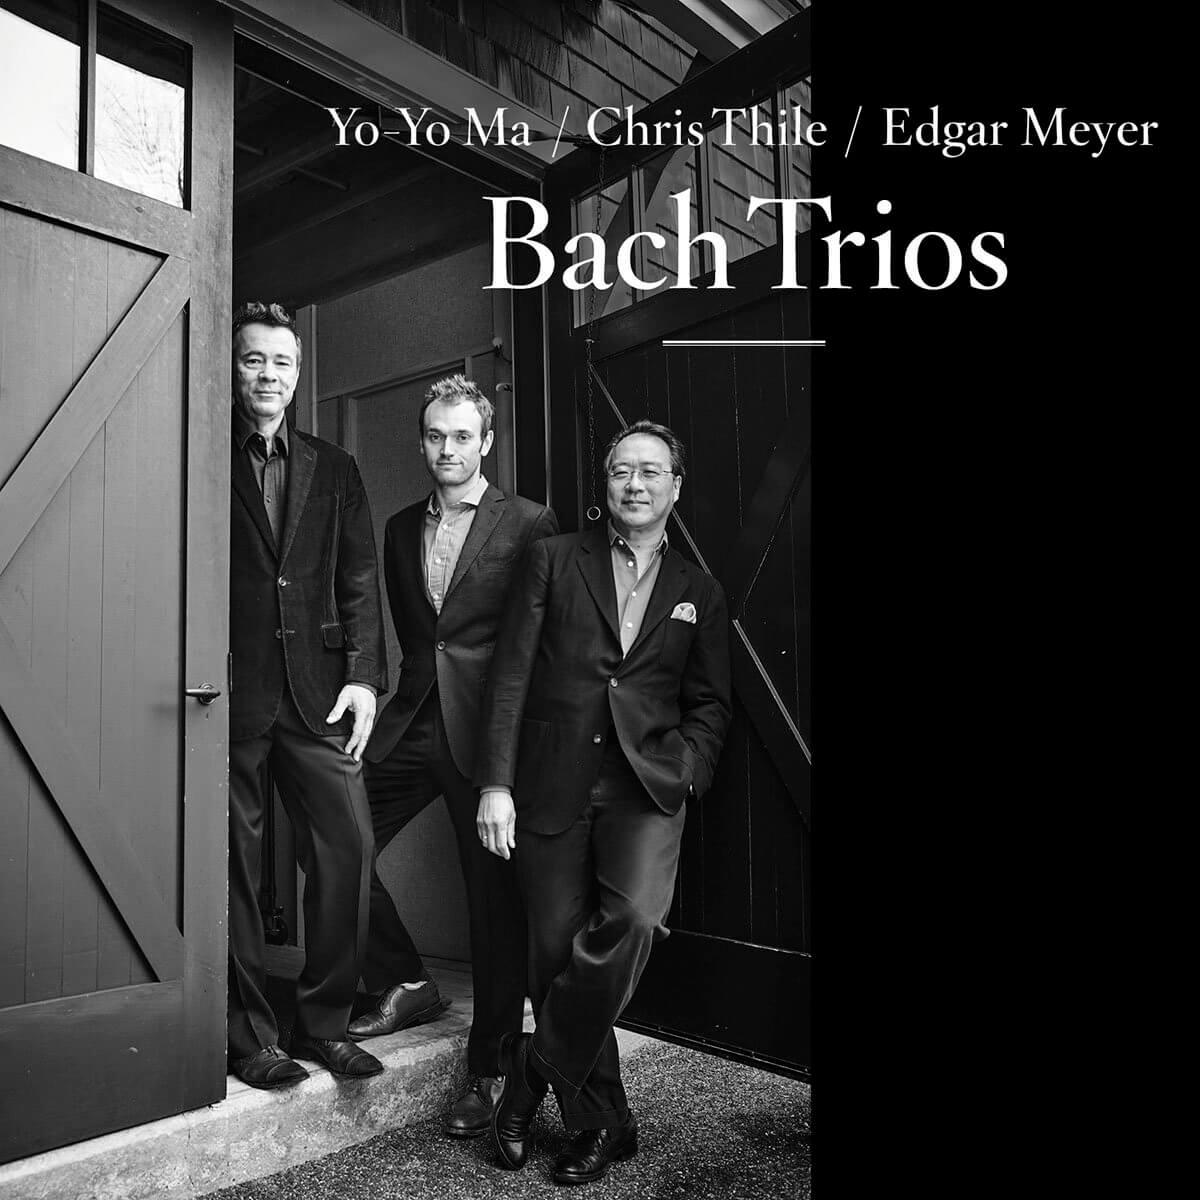 Bach Trios   Chris Thile & Edgar Meyer Yo-Yo Ma (Nonesuch Records)